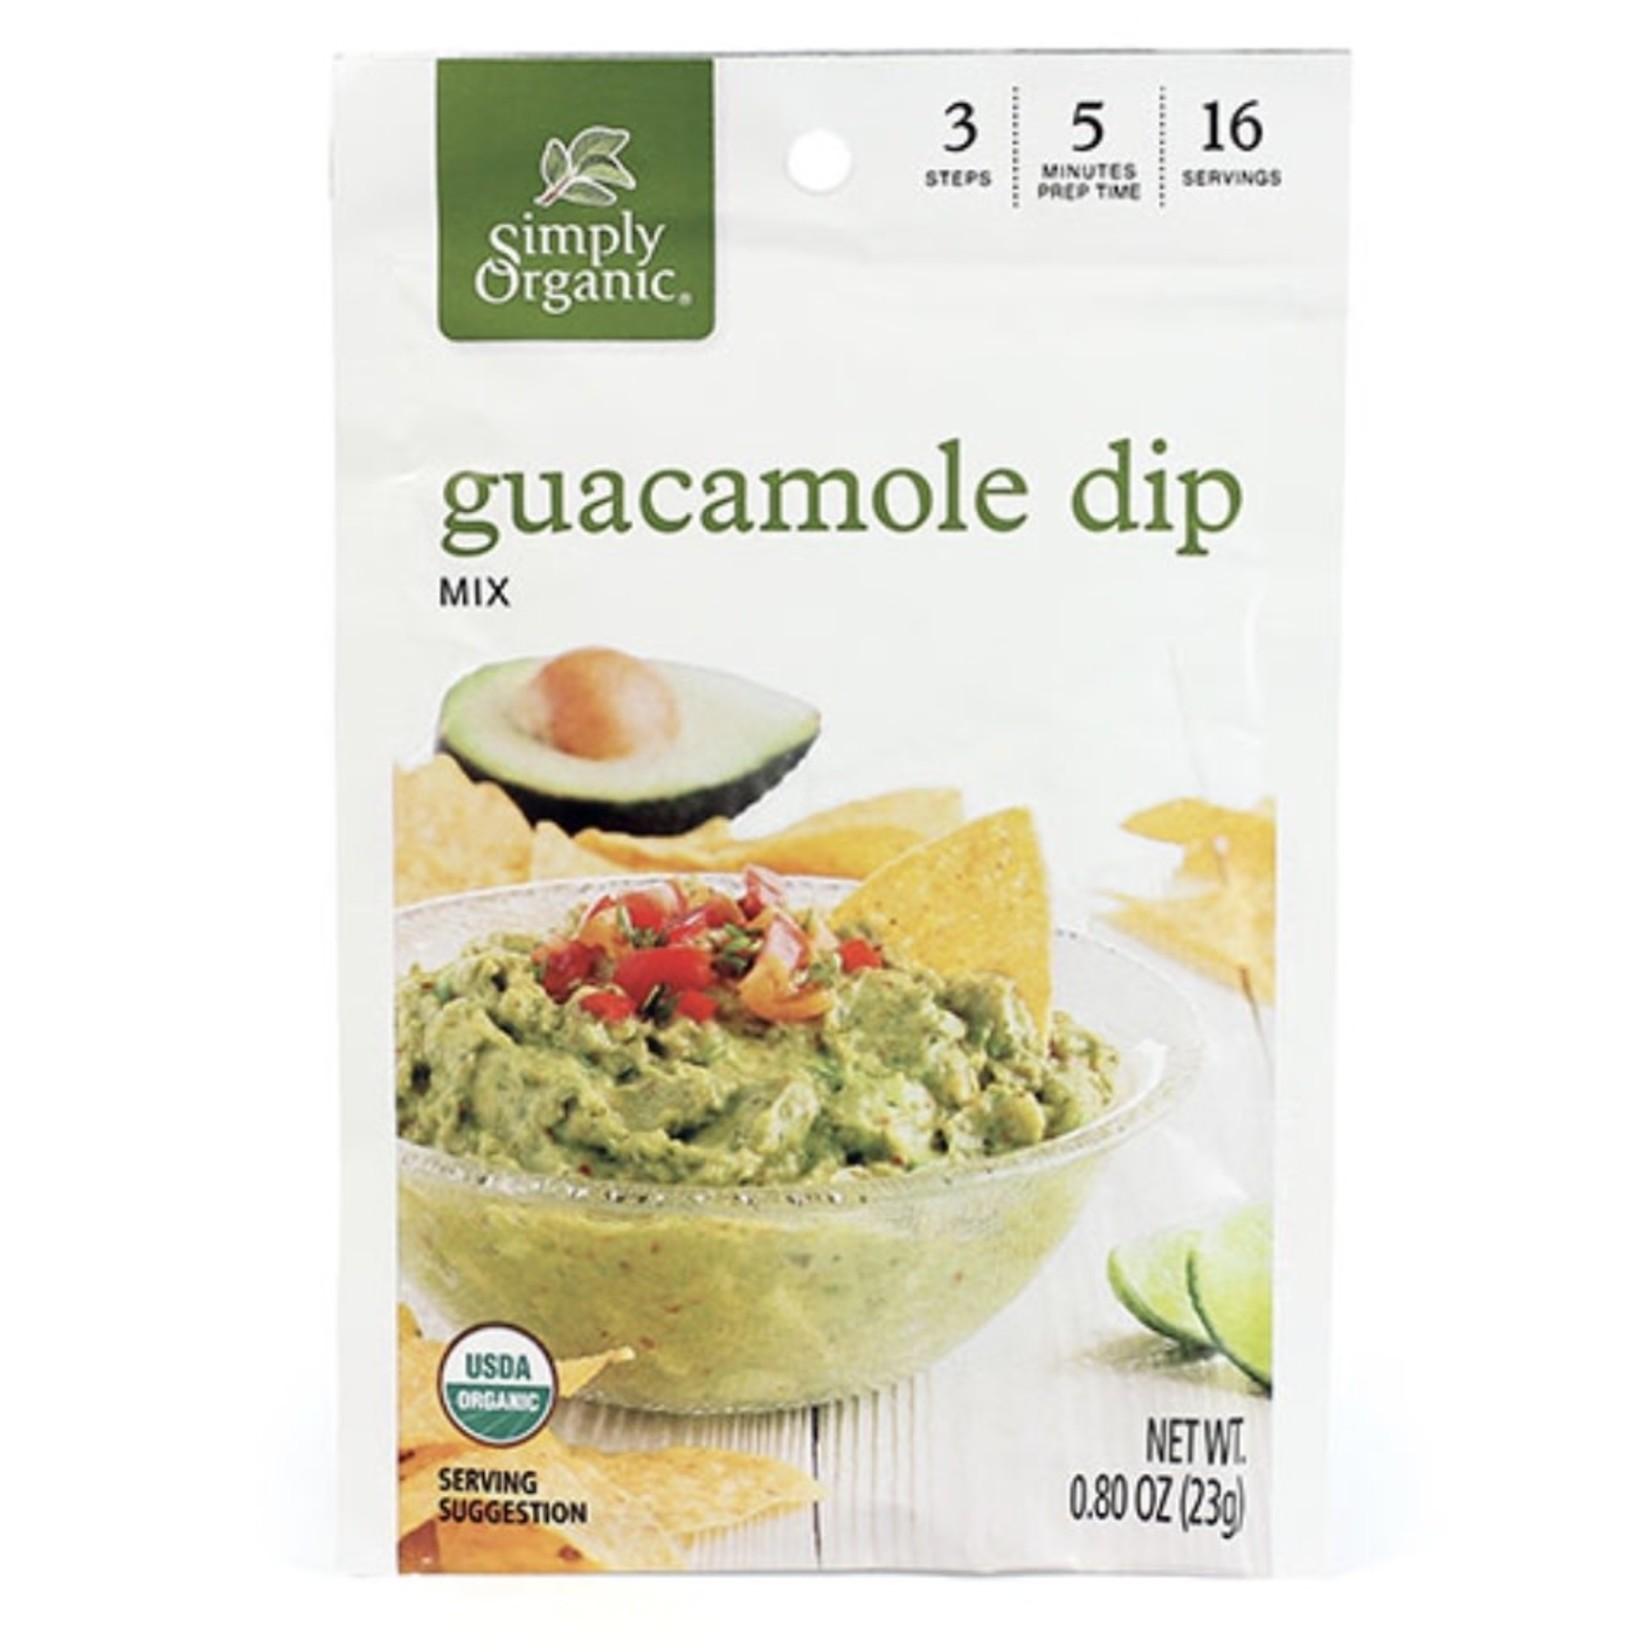 Simply Organic Simply Organic Guacamole Dip